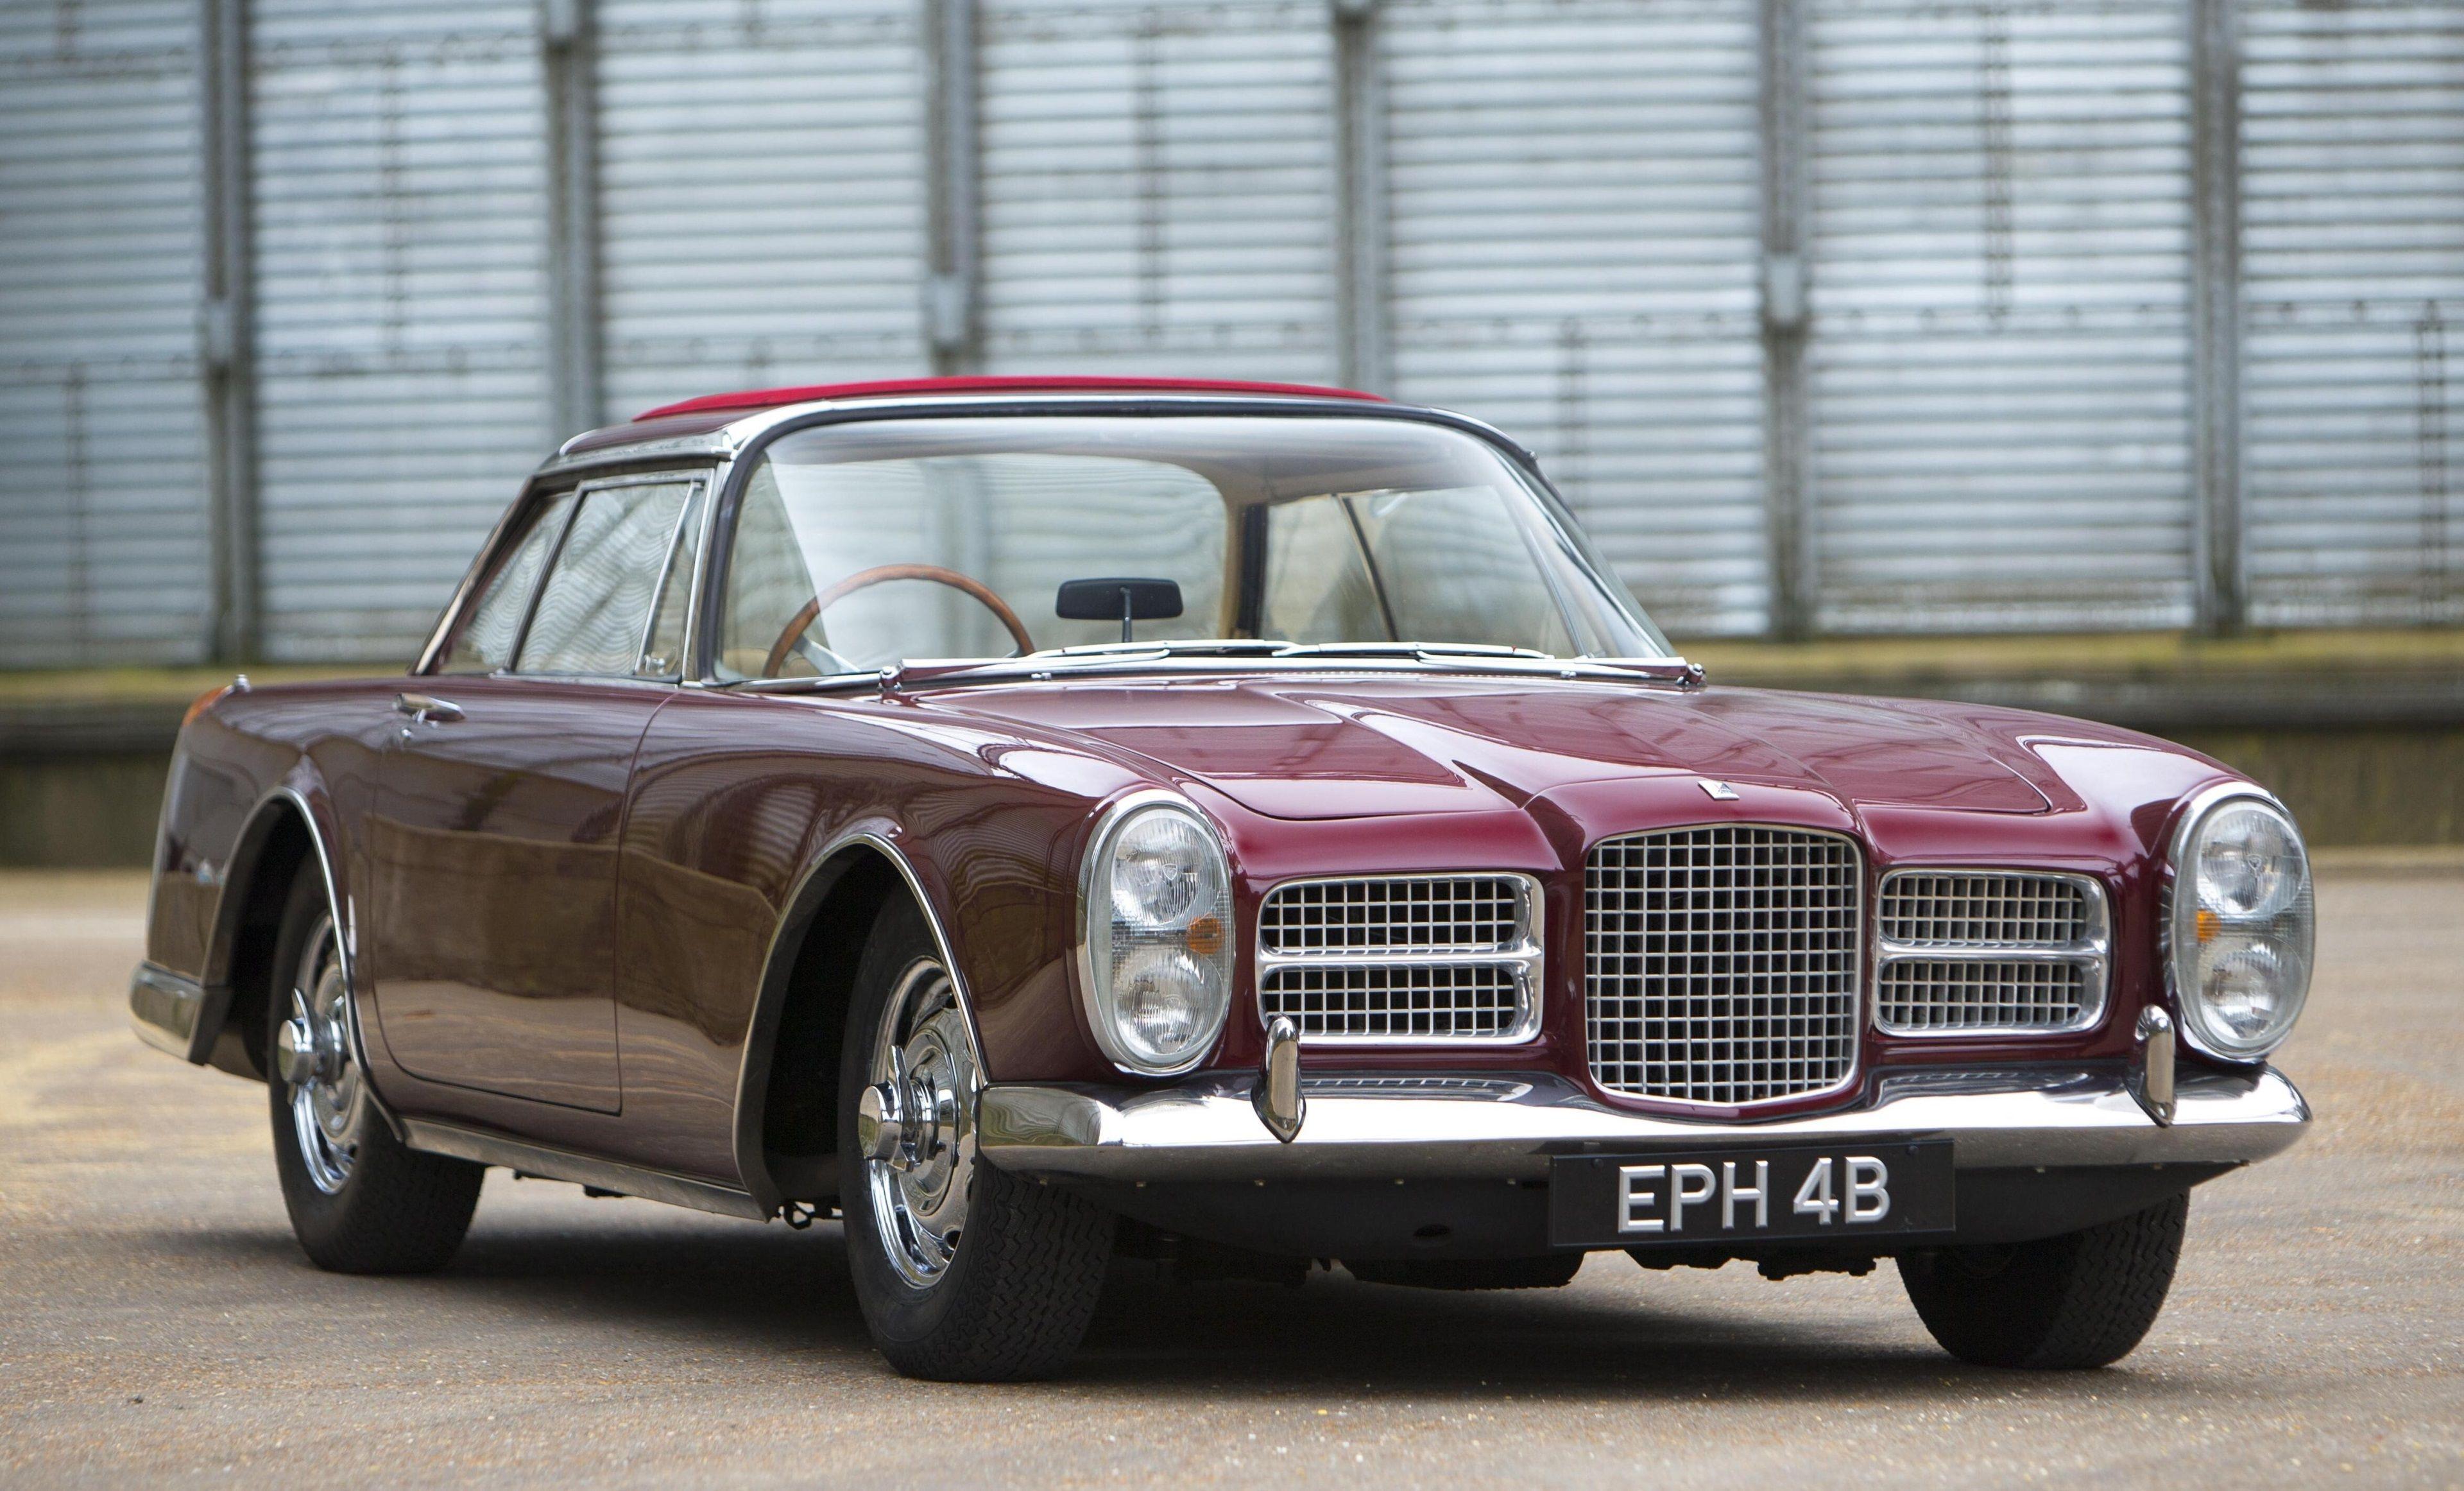 3840x2323 Facel Vega 4k Free Download Hd Wallpaper Classic Cars Expensive Sports Cars Super Cars